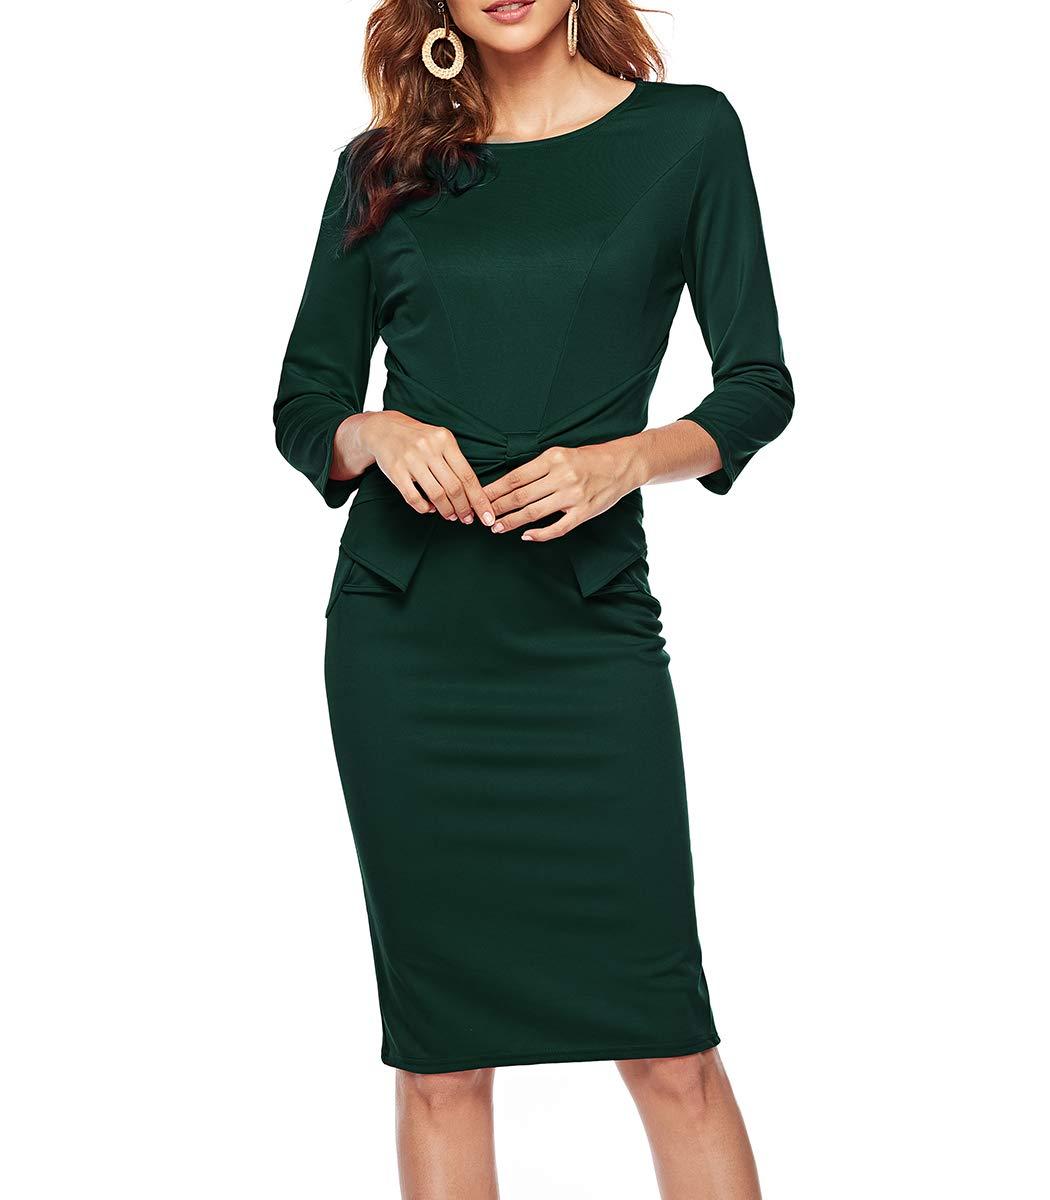 a1e5ddebf9dd CEASIKERY Womens 3/4 Sleeves Office Casual Pencil Wear to Work Church  Sheath Dress 40